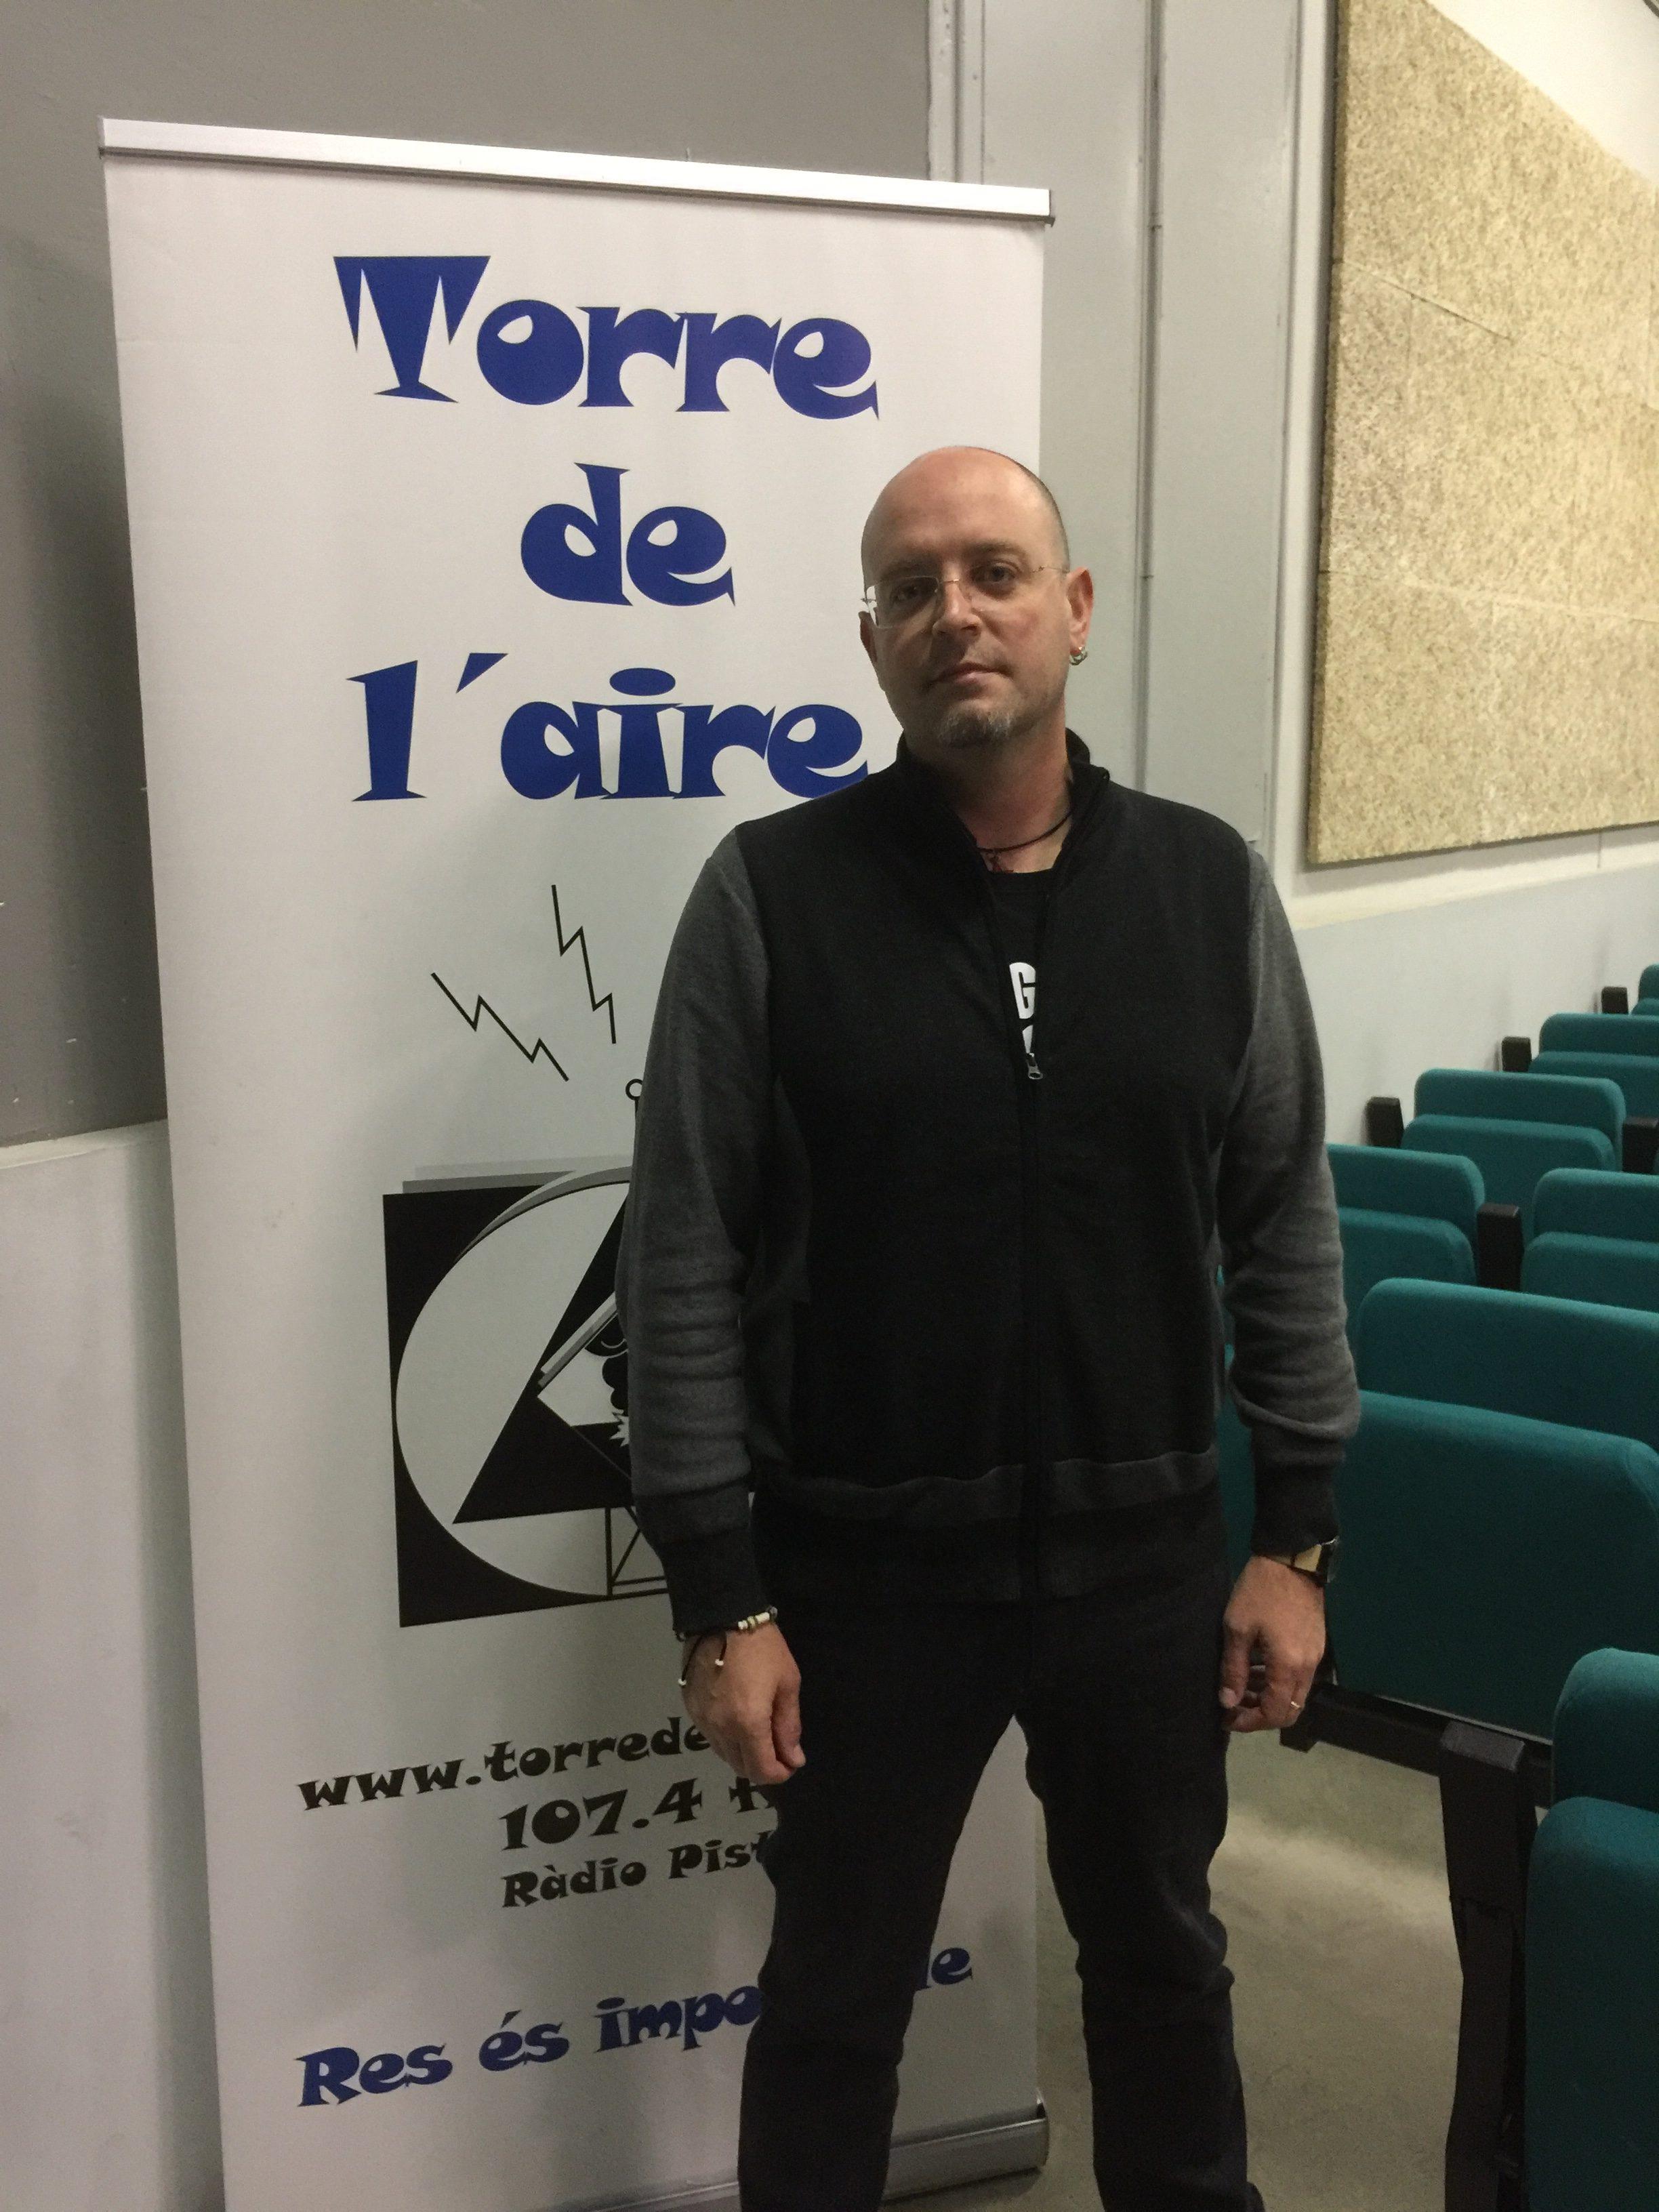 Jordi Gamez